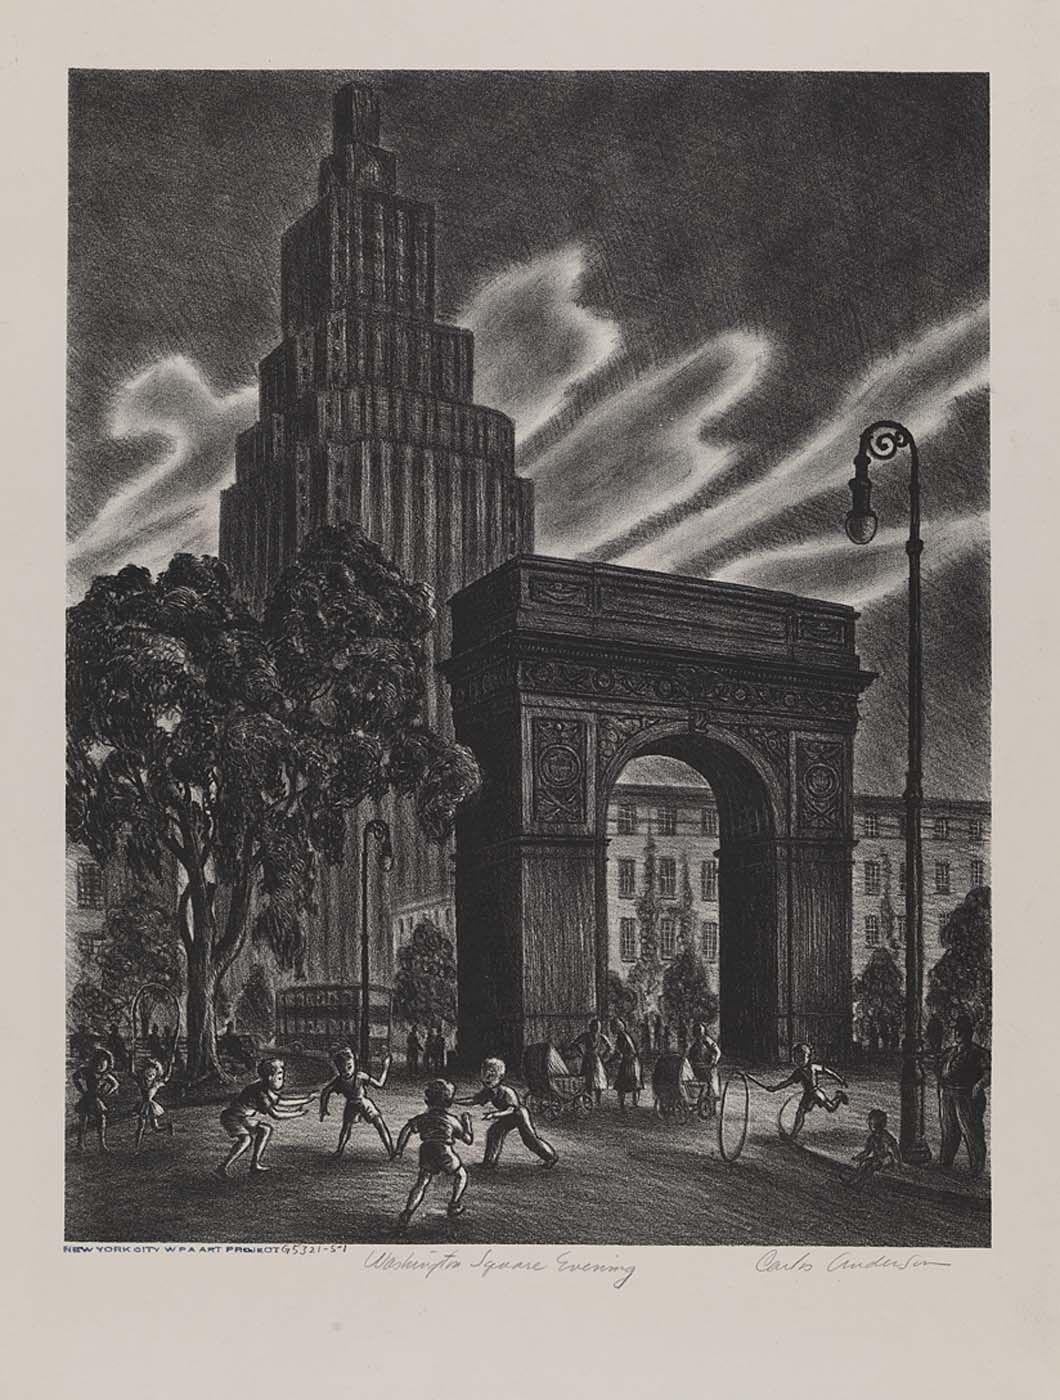 Washington Square Evening, n.d., Carlos Anderson - Smithsonian American Art Museum